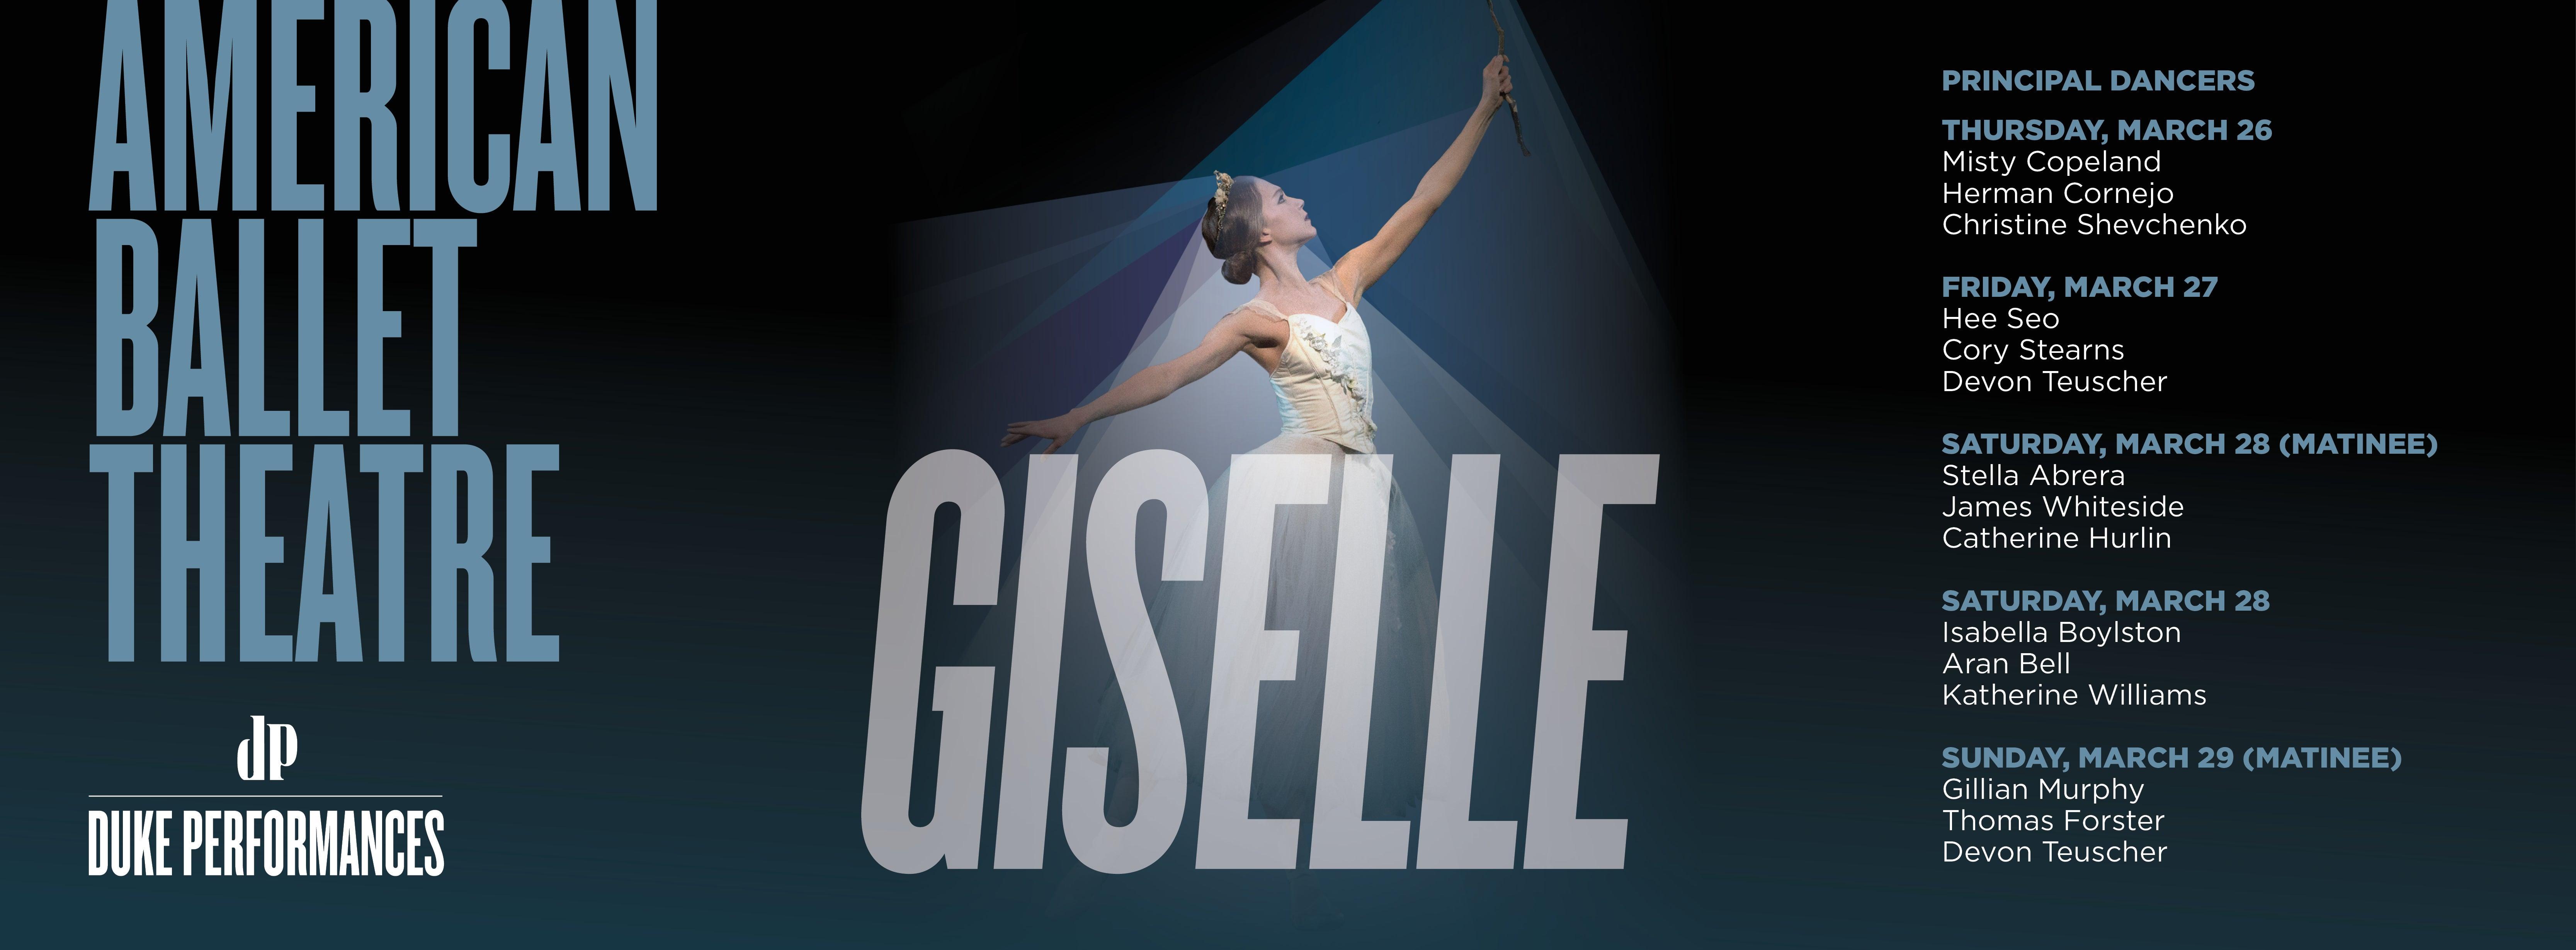 American Ballet Theatre